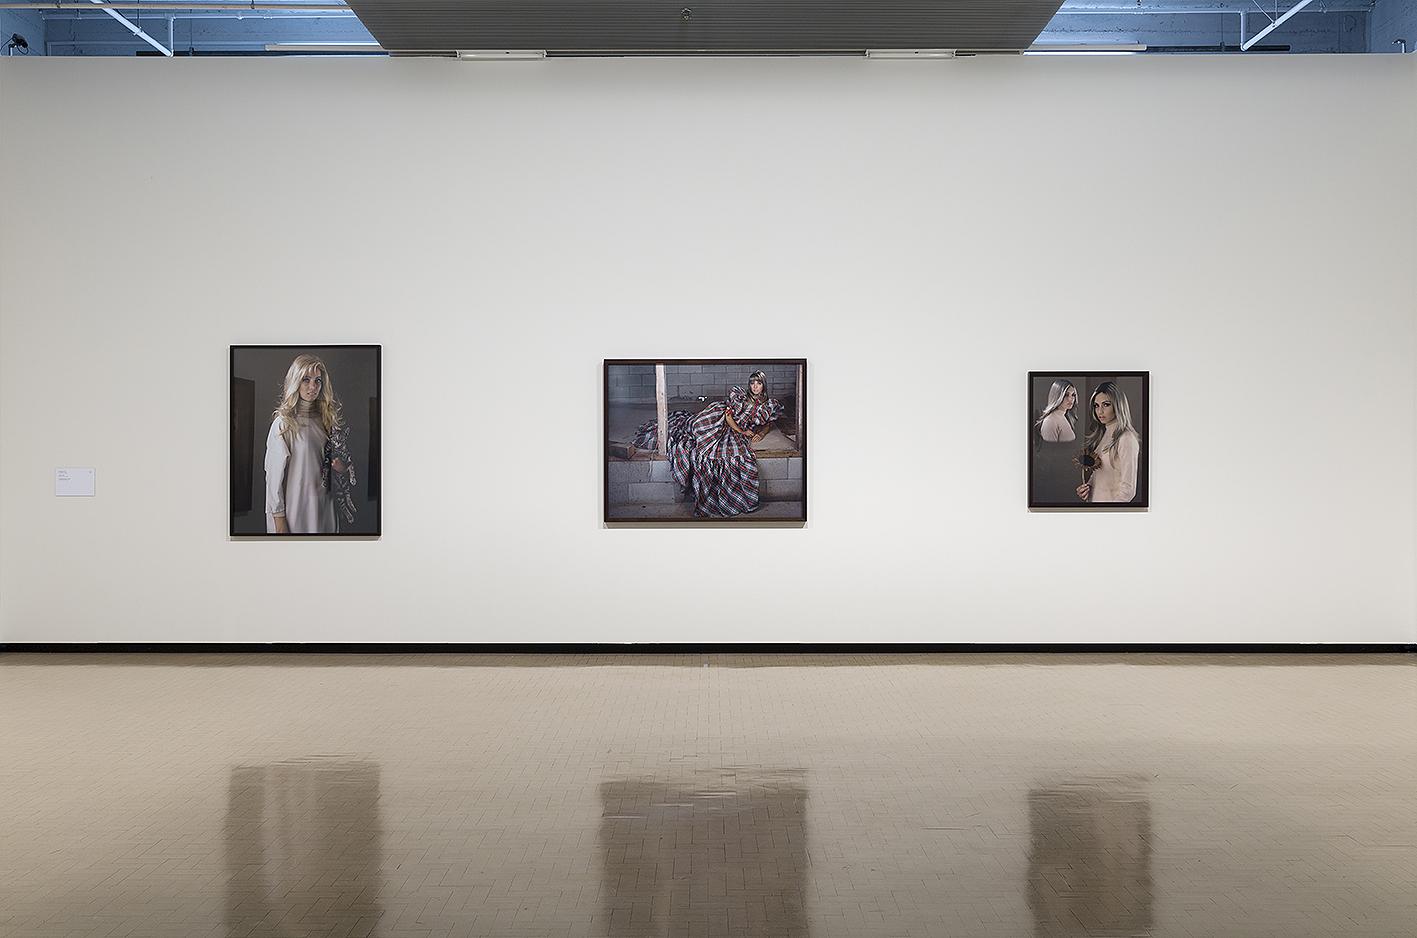 City Gallery_Yvonne Todd_Creamy Psychology_documentation_hiRez_022.jpg